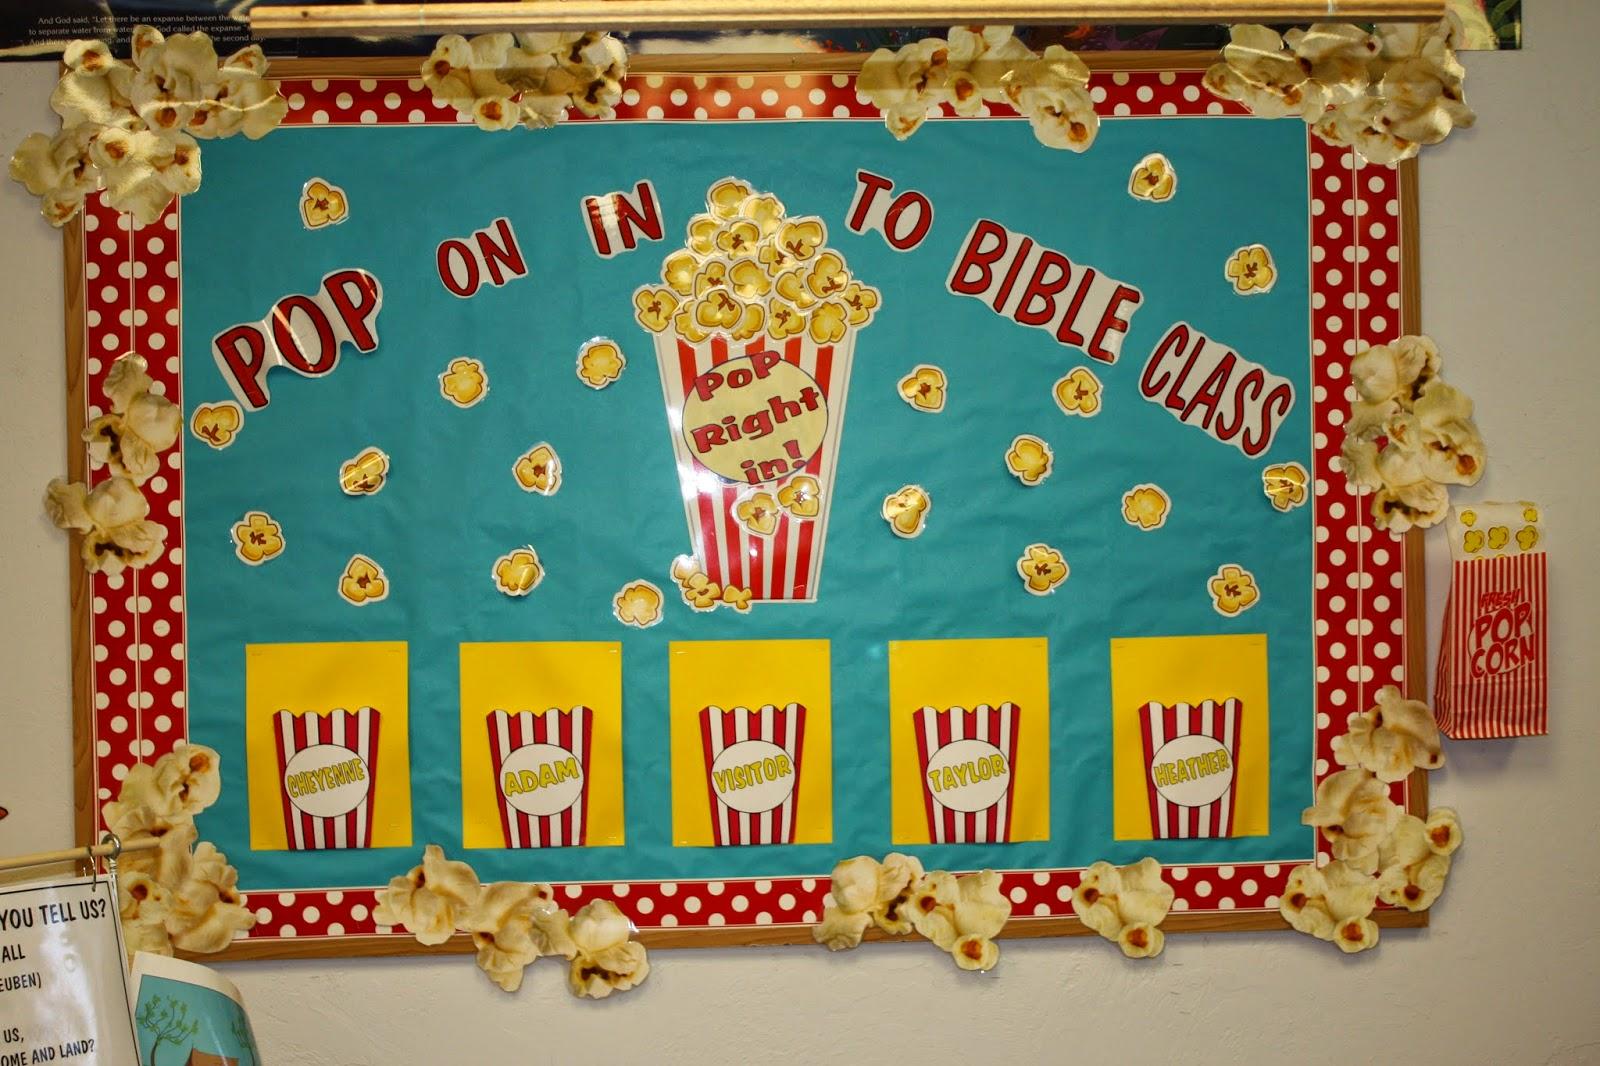 Hands On Bible Teacher Pop On In To Bible Class Attendance Charts